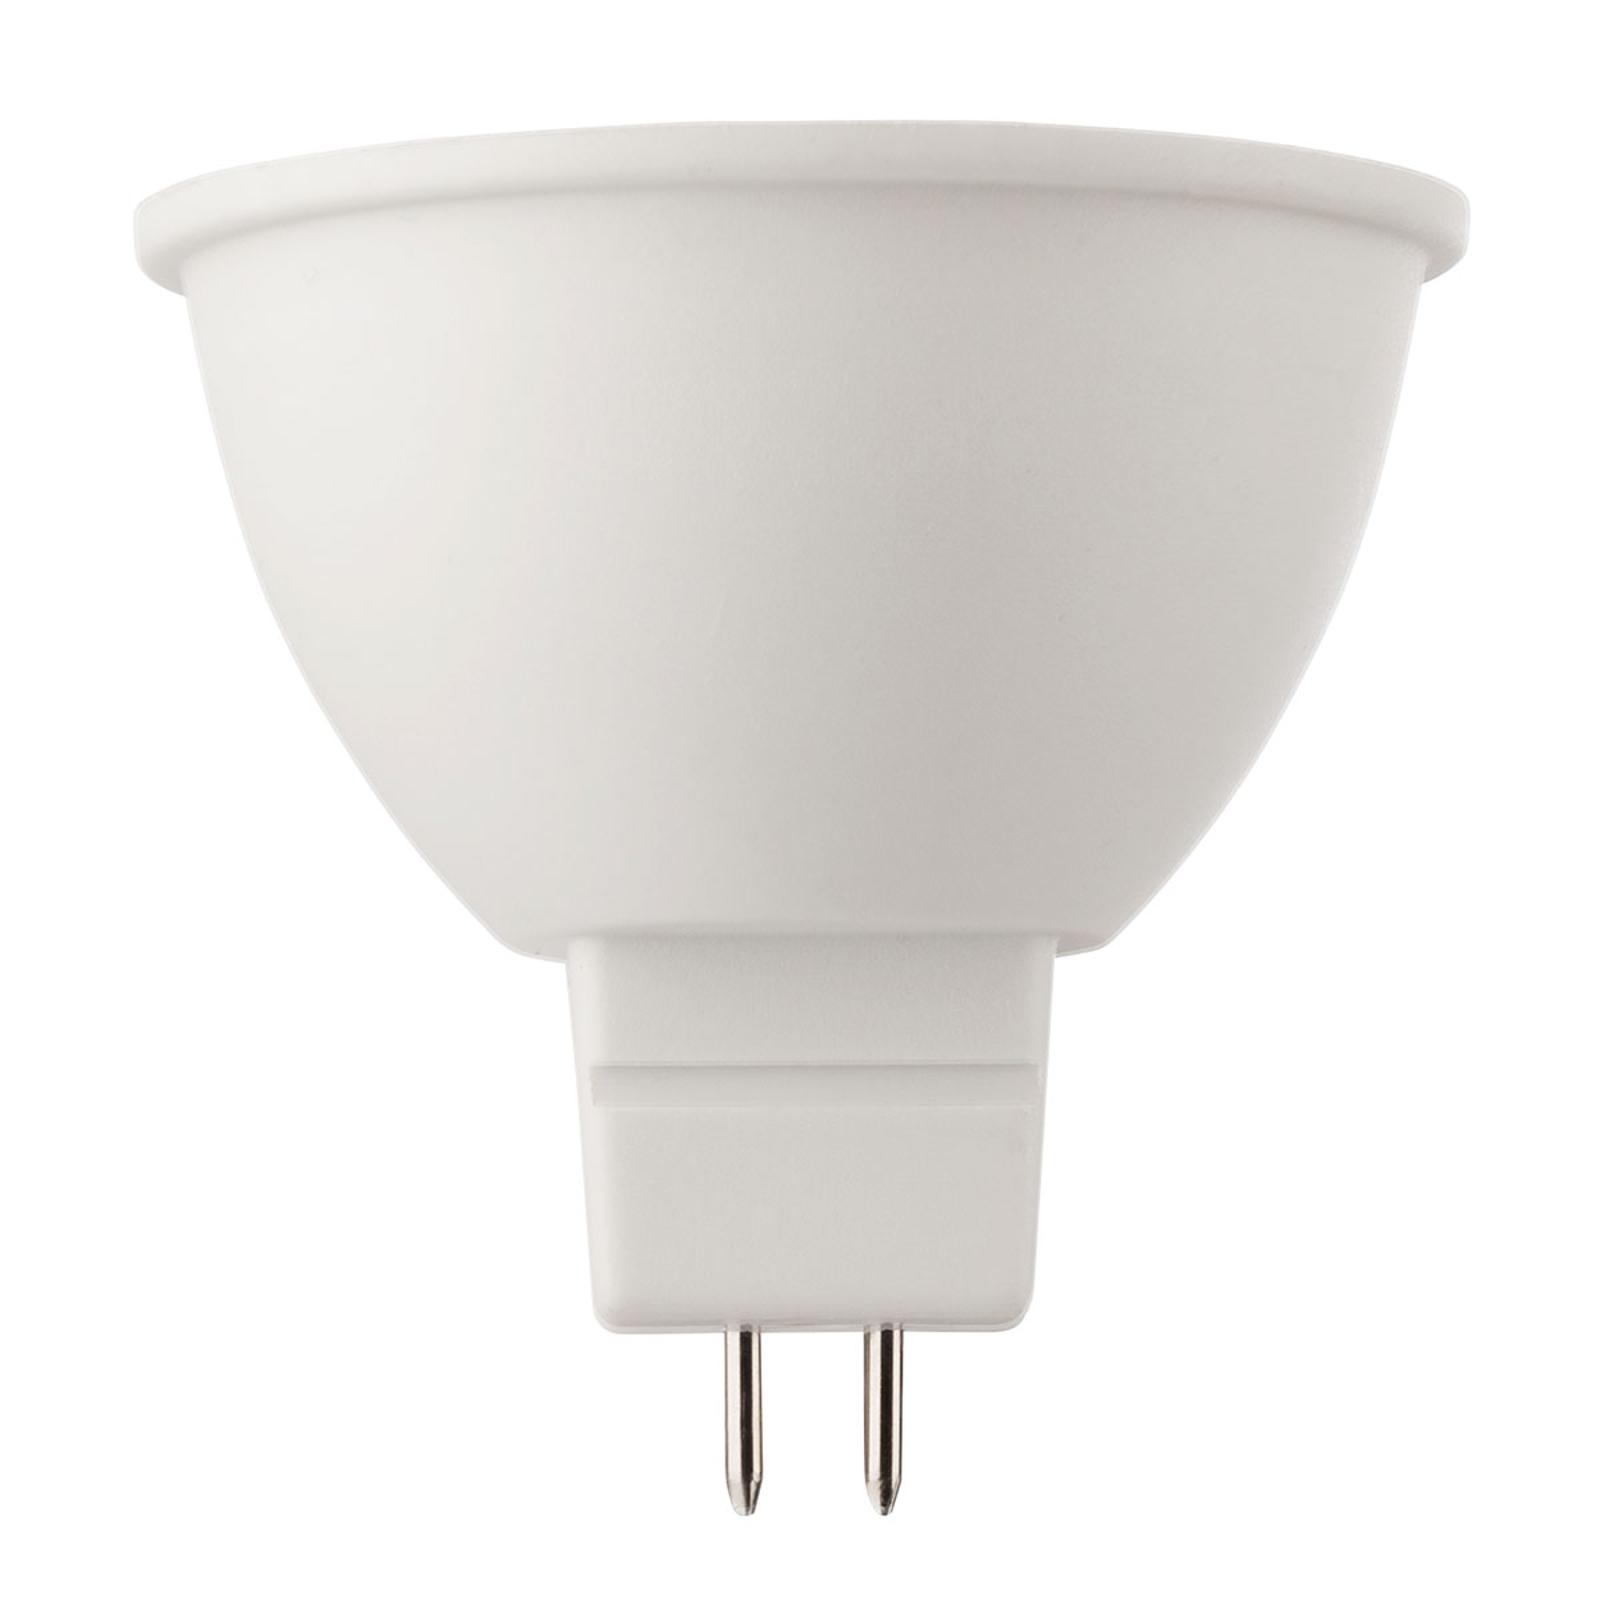 Riflettore LED GU5,3 8W 36° bianco neutro